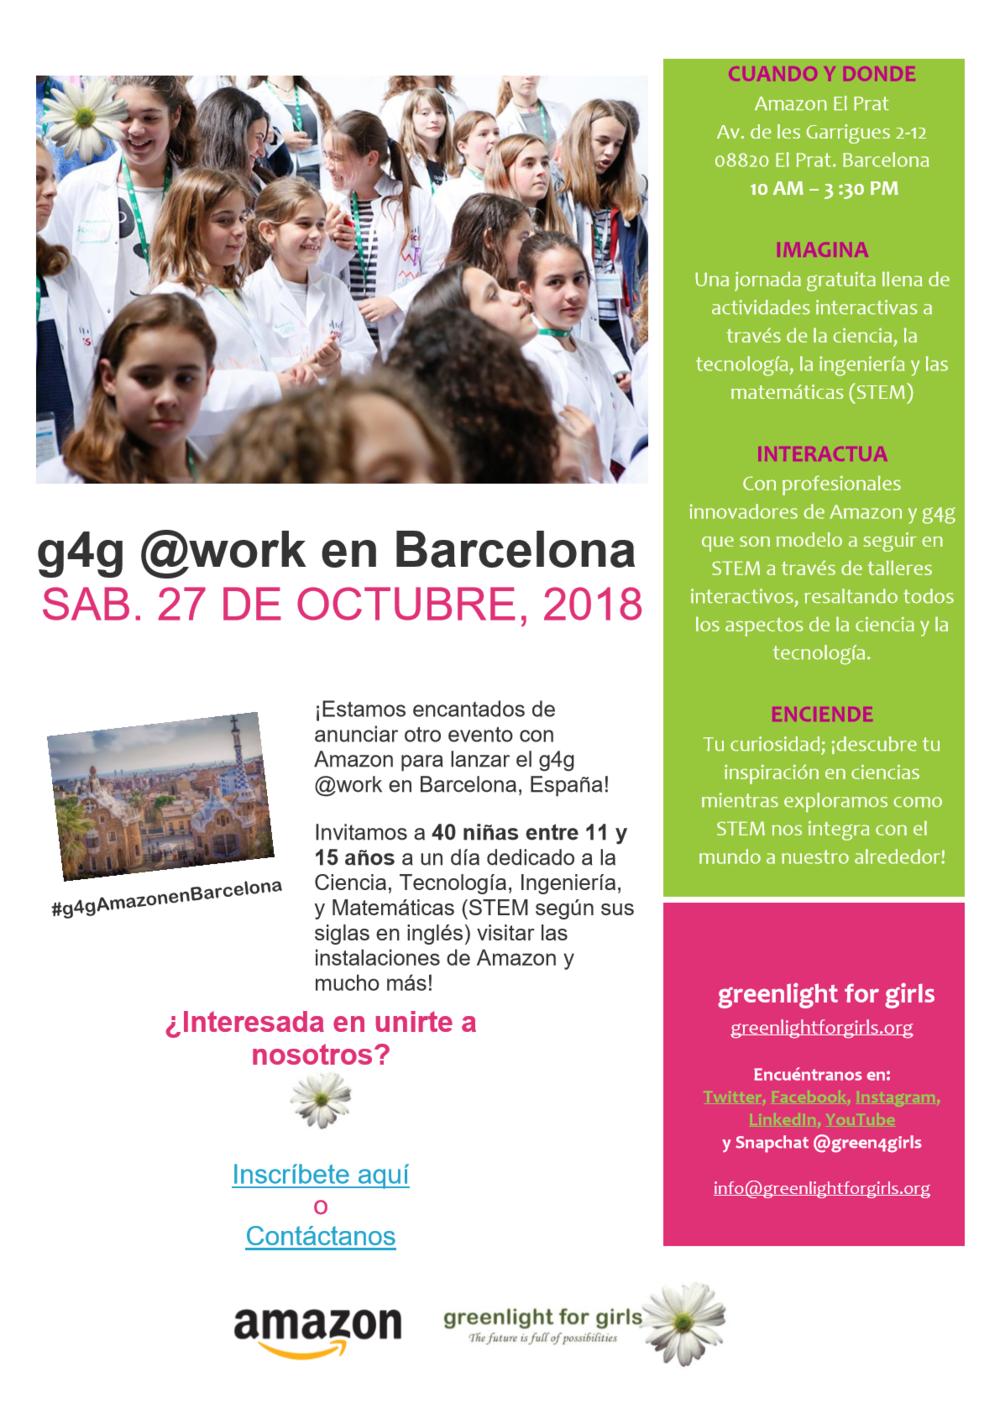 g4gatwork_Barcelona2018_ES.jpg